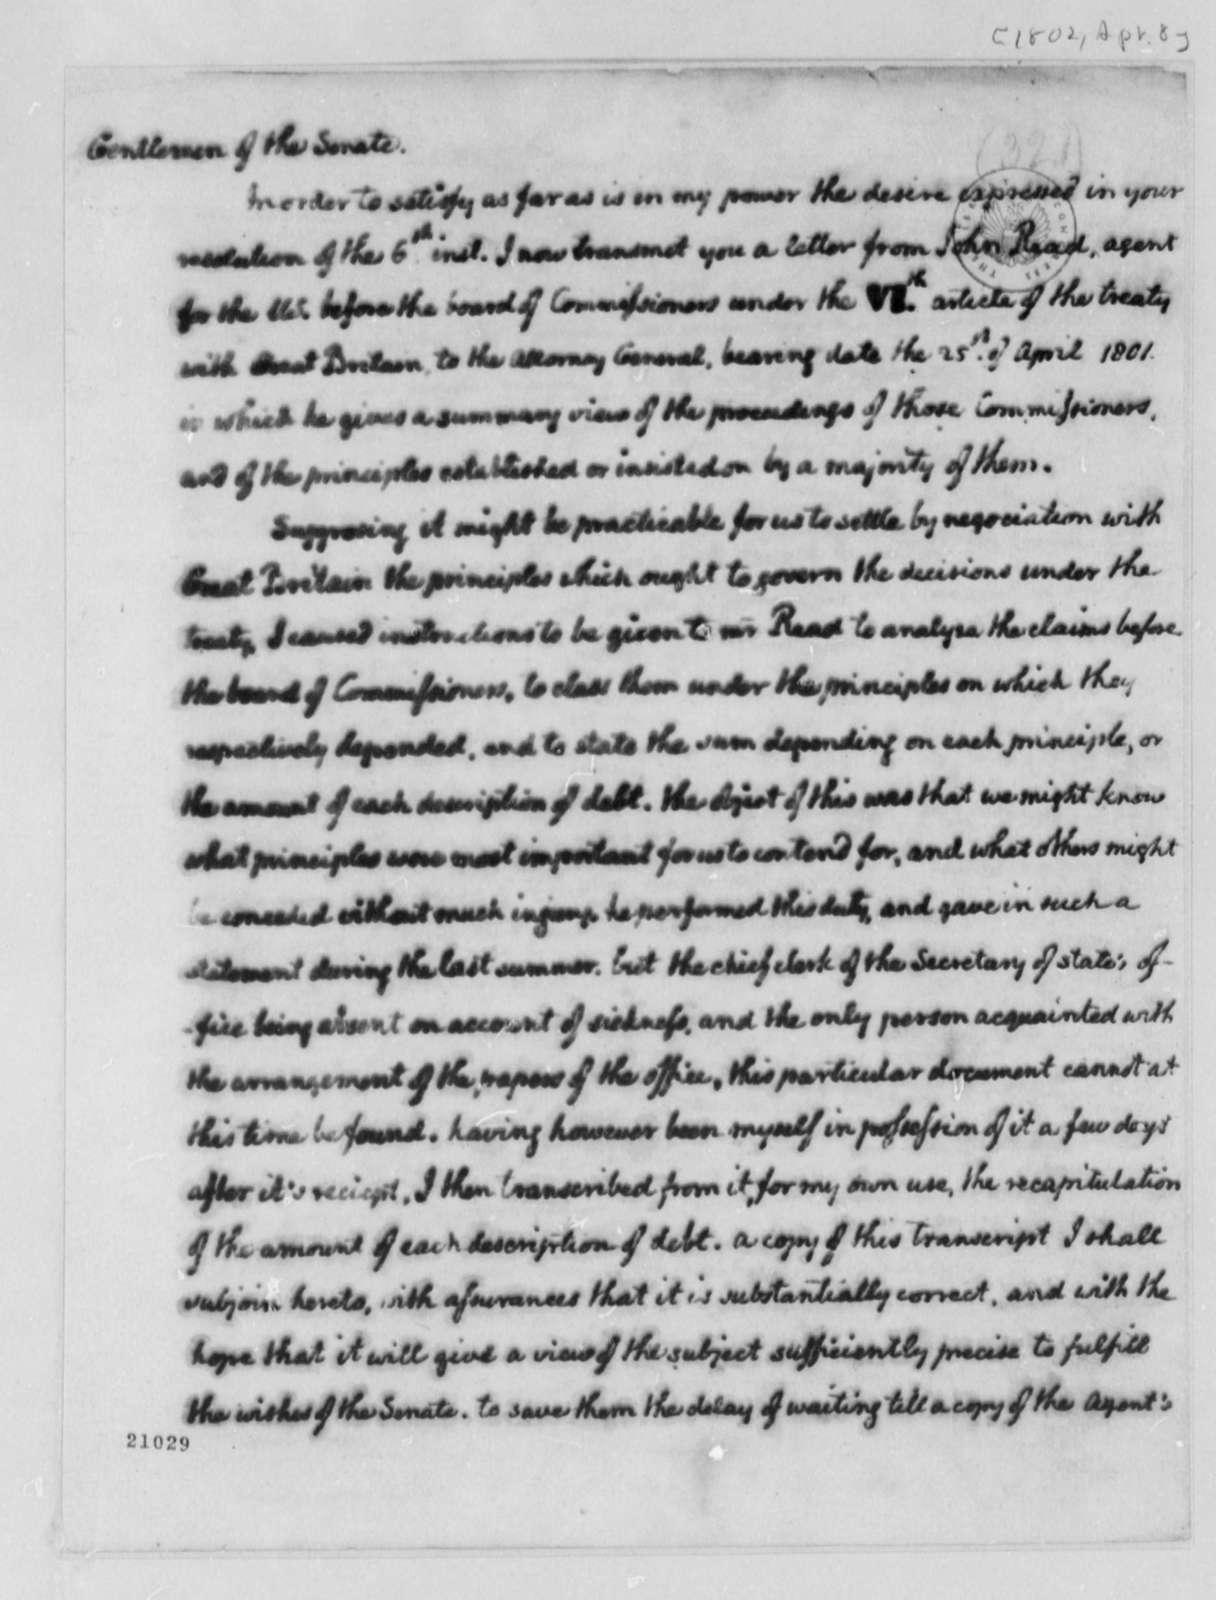 Thomas Jefferson to Senate, April 8, 1802